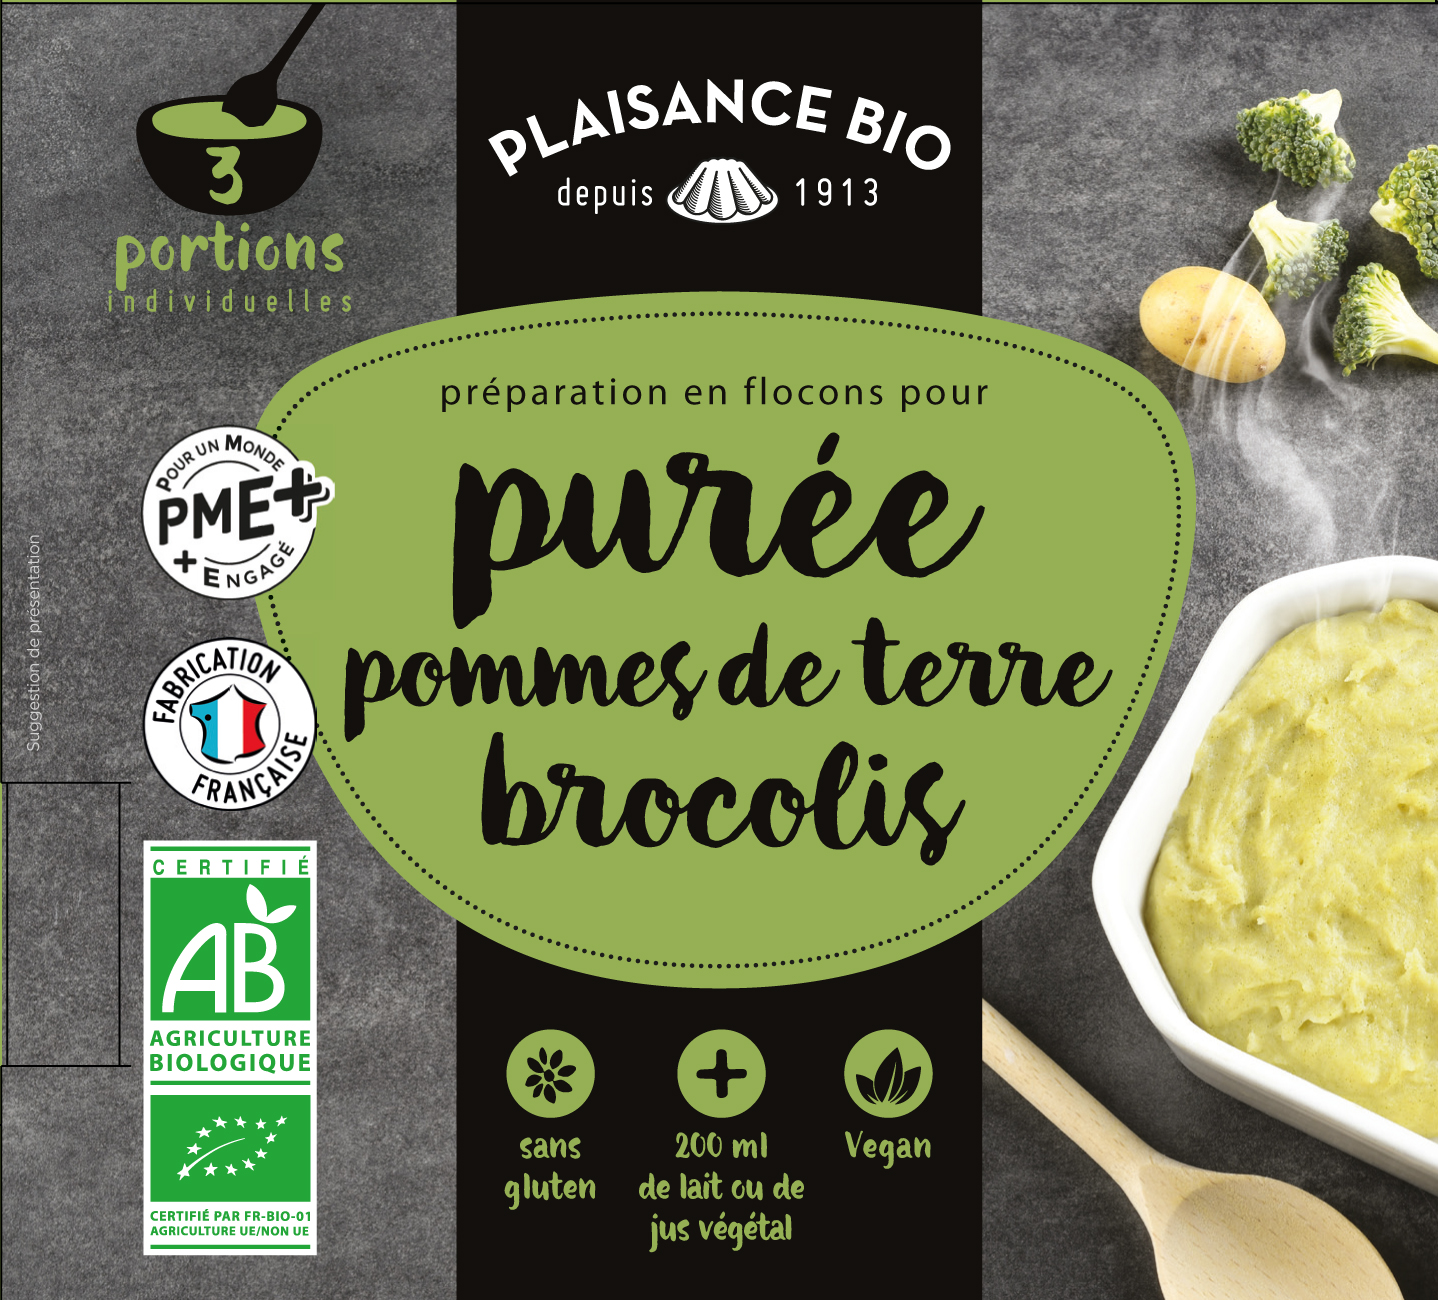 PUREE PDT BROCOLIS PLAISANCE BIO 2019